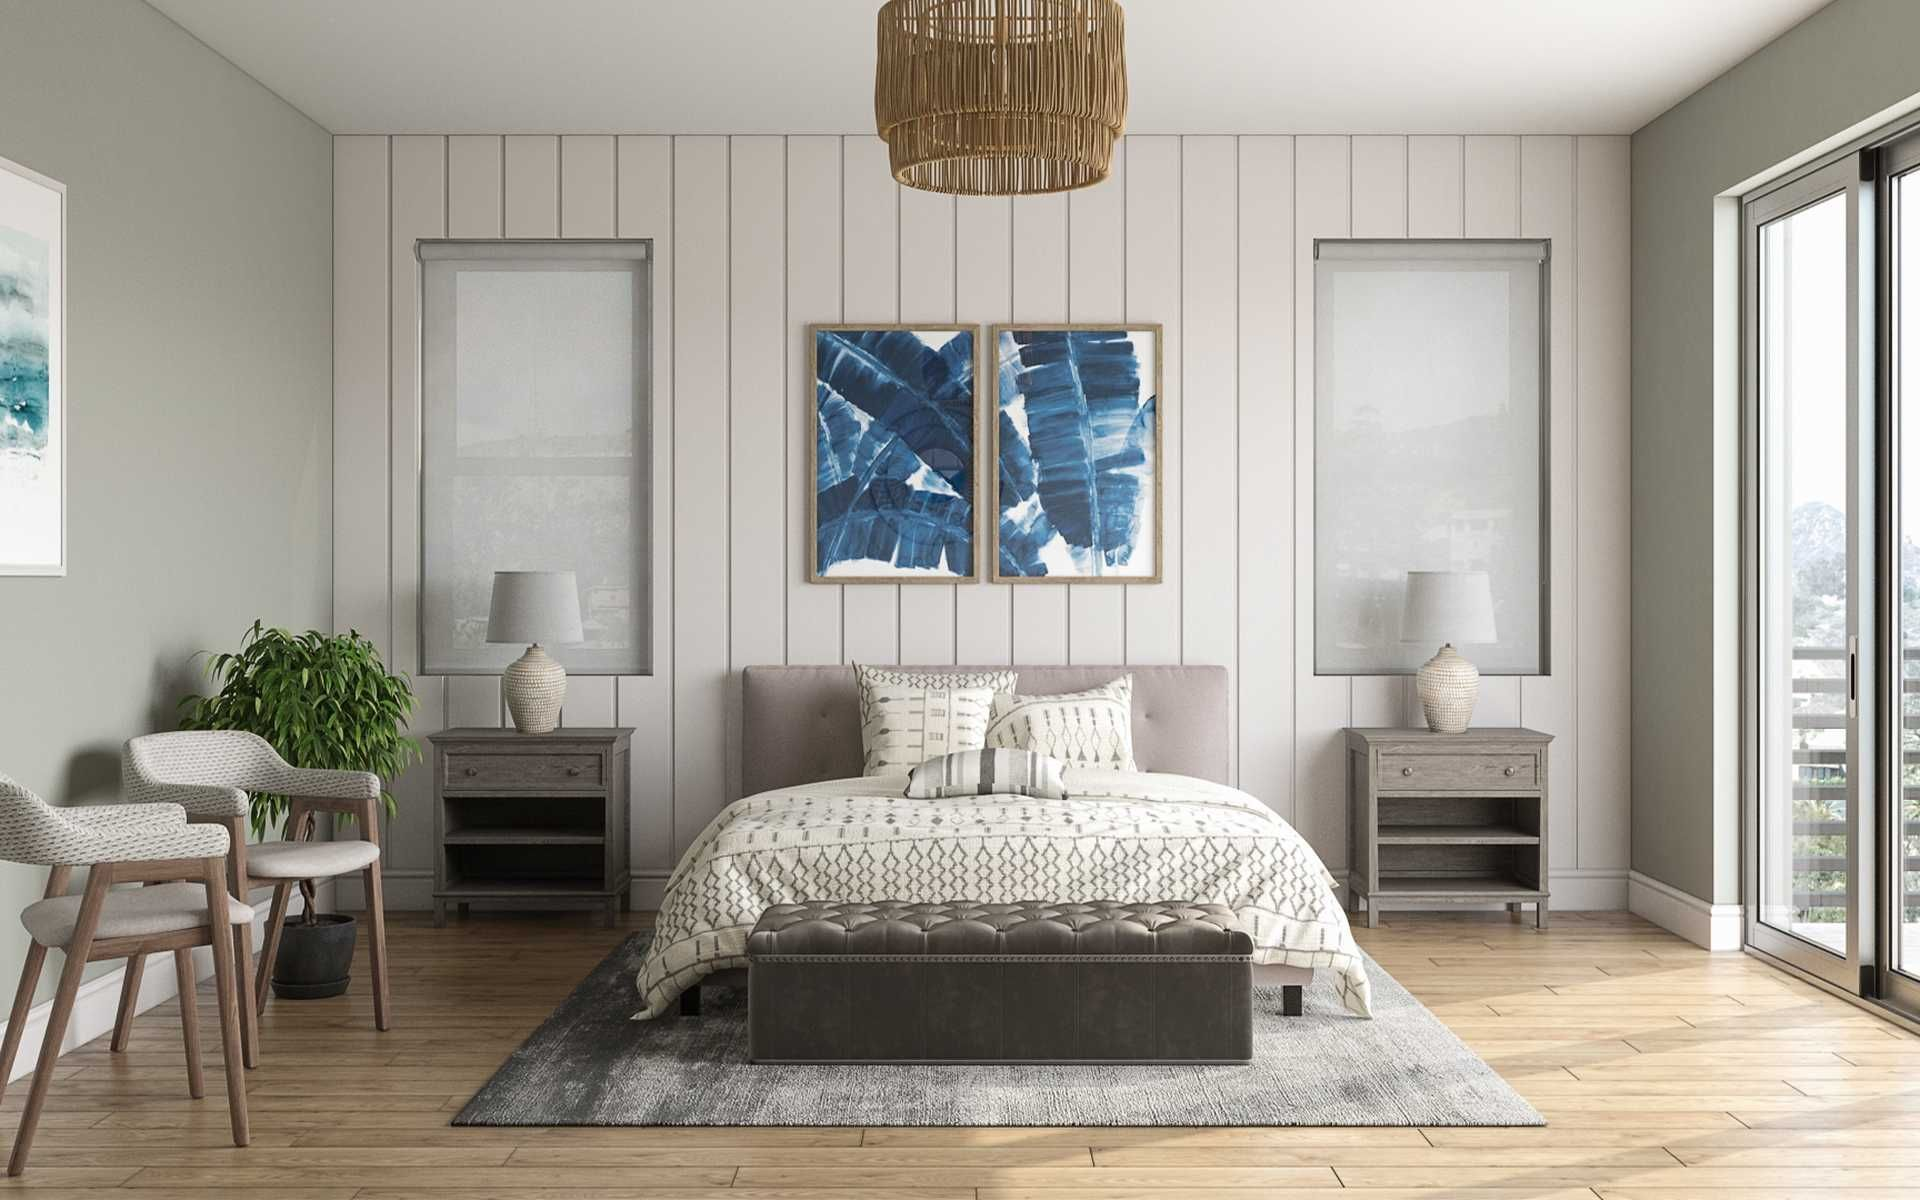 Coastal Farmhouse Bedroom Design By Havenly Interior Designer Caitlin In 2021 Bedroom Furniture Design Interior Design Bedroom Design